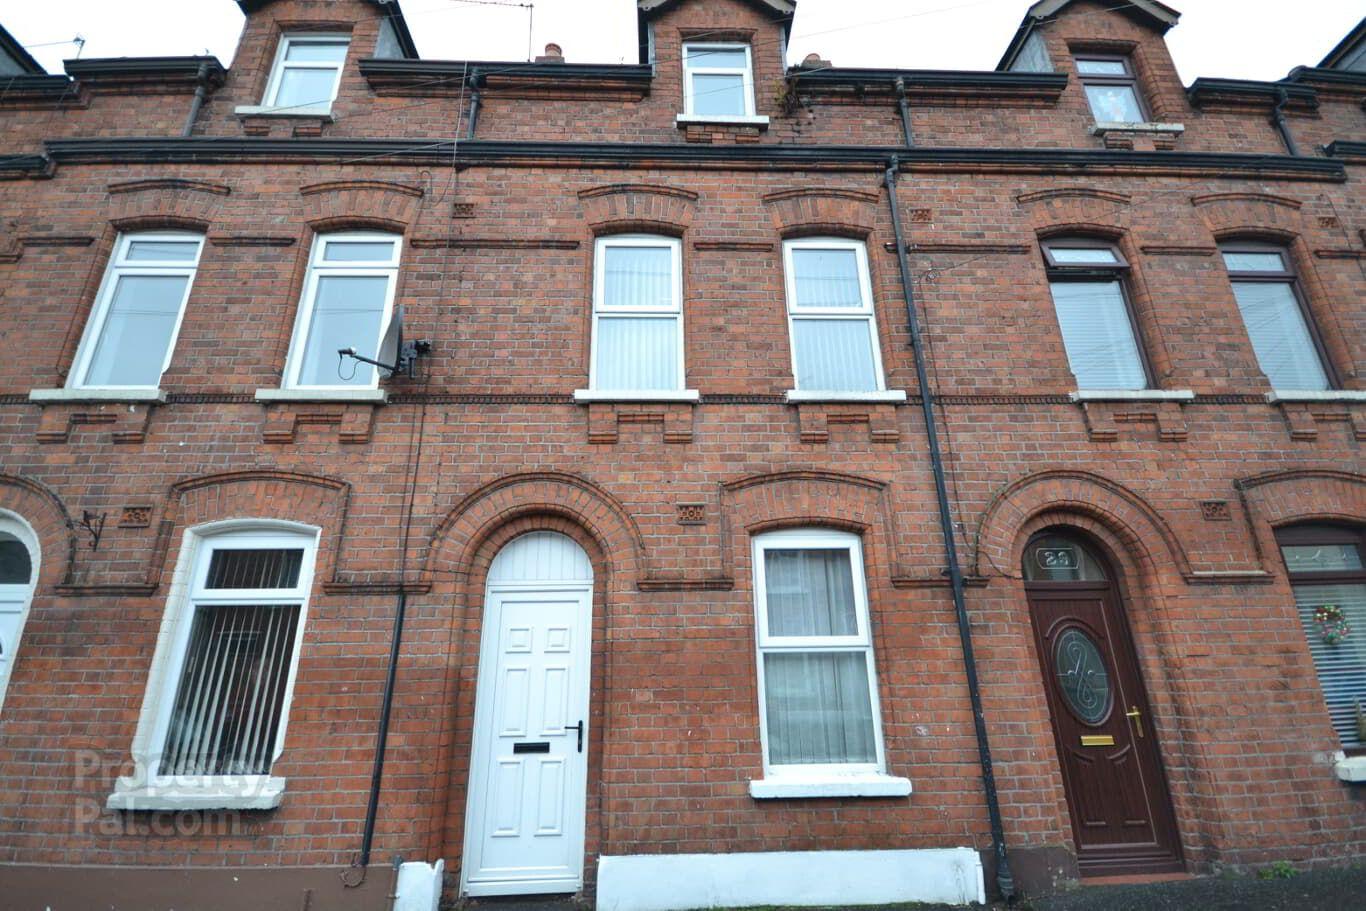 31 Crocus Street, Belfast BT12 7AP | 4 Bed Terrace house For Sale | Asking price £79,950 | PropertyPal